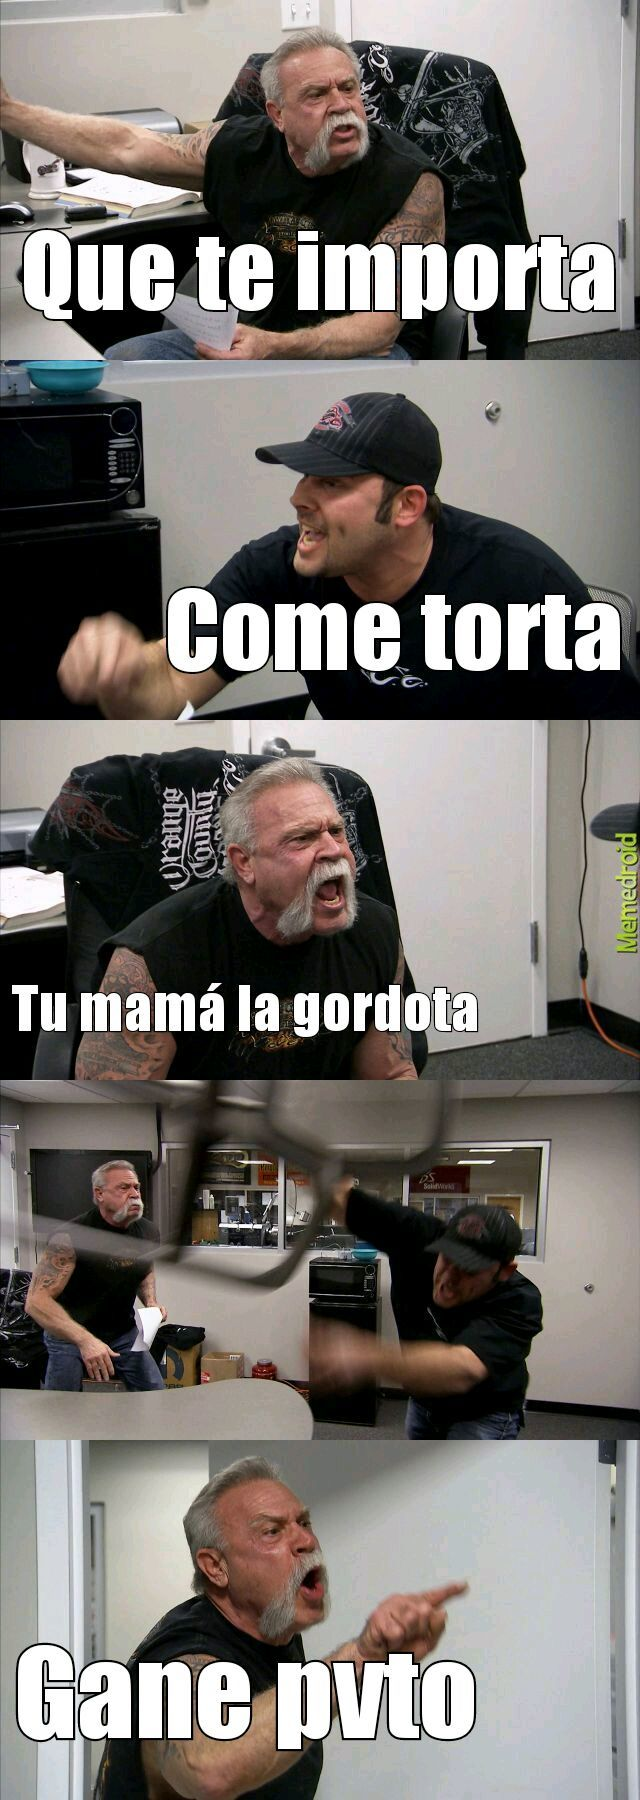 Come torta - meme